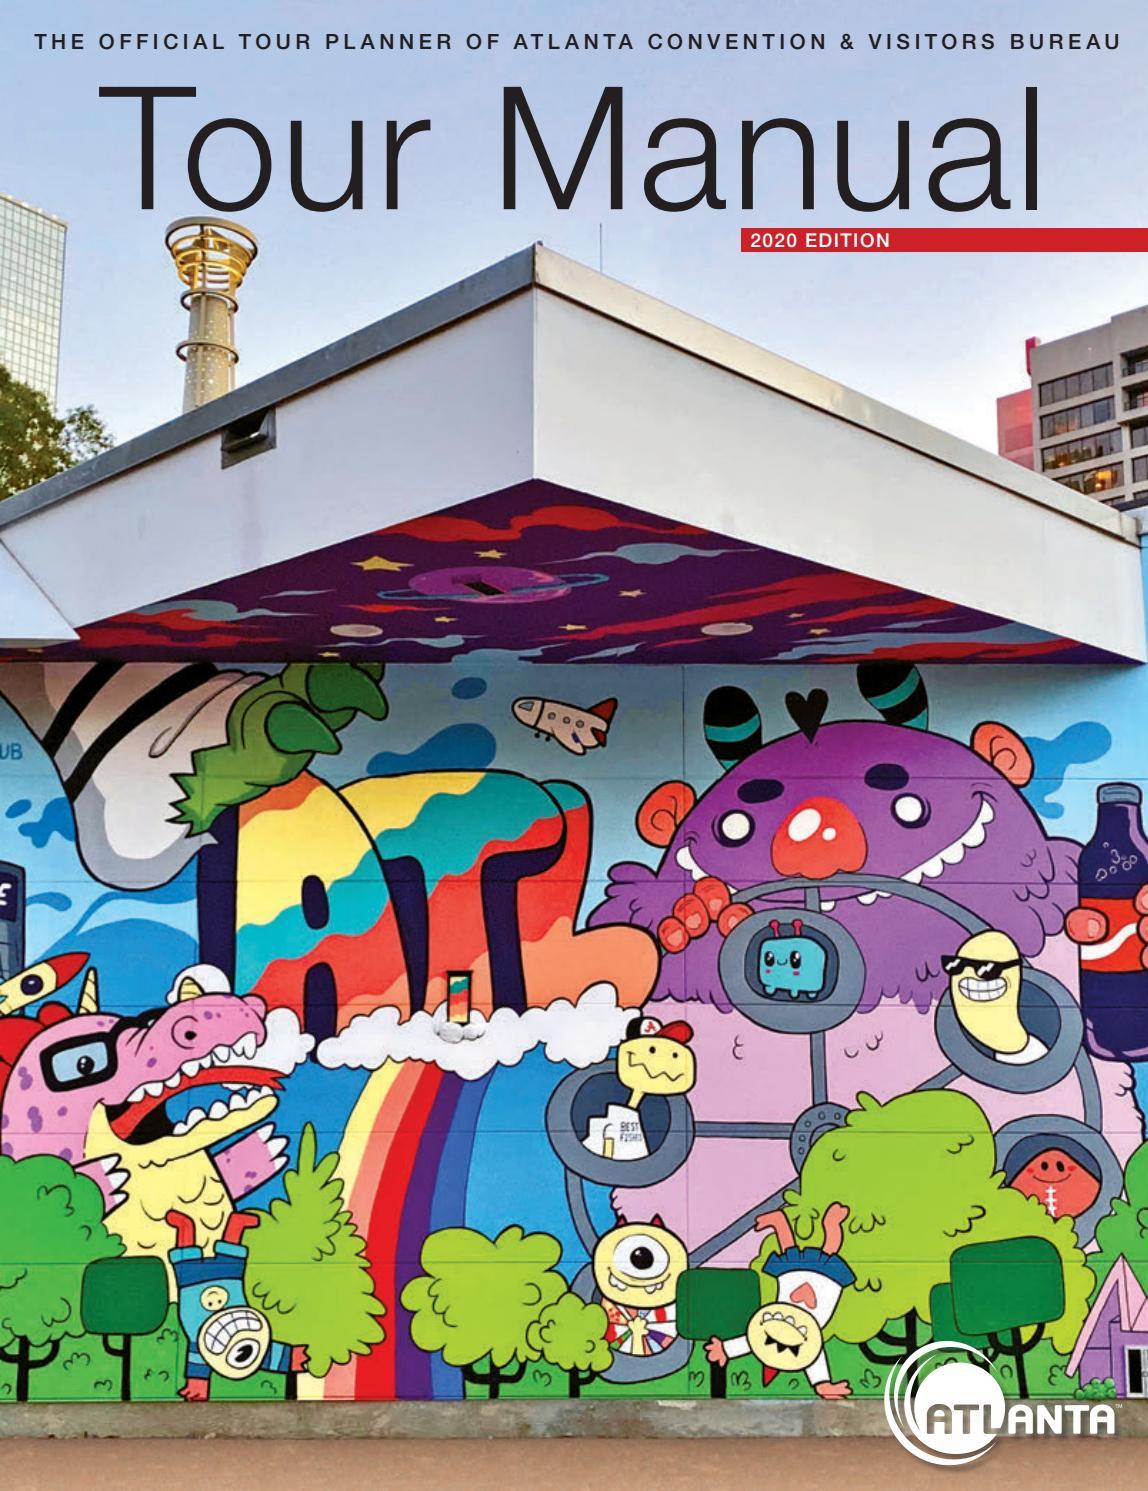 Tour Manual 2020 Edition By Atlanta Cvb Issuu